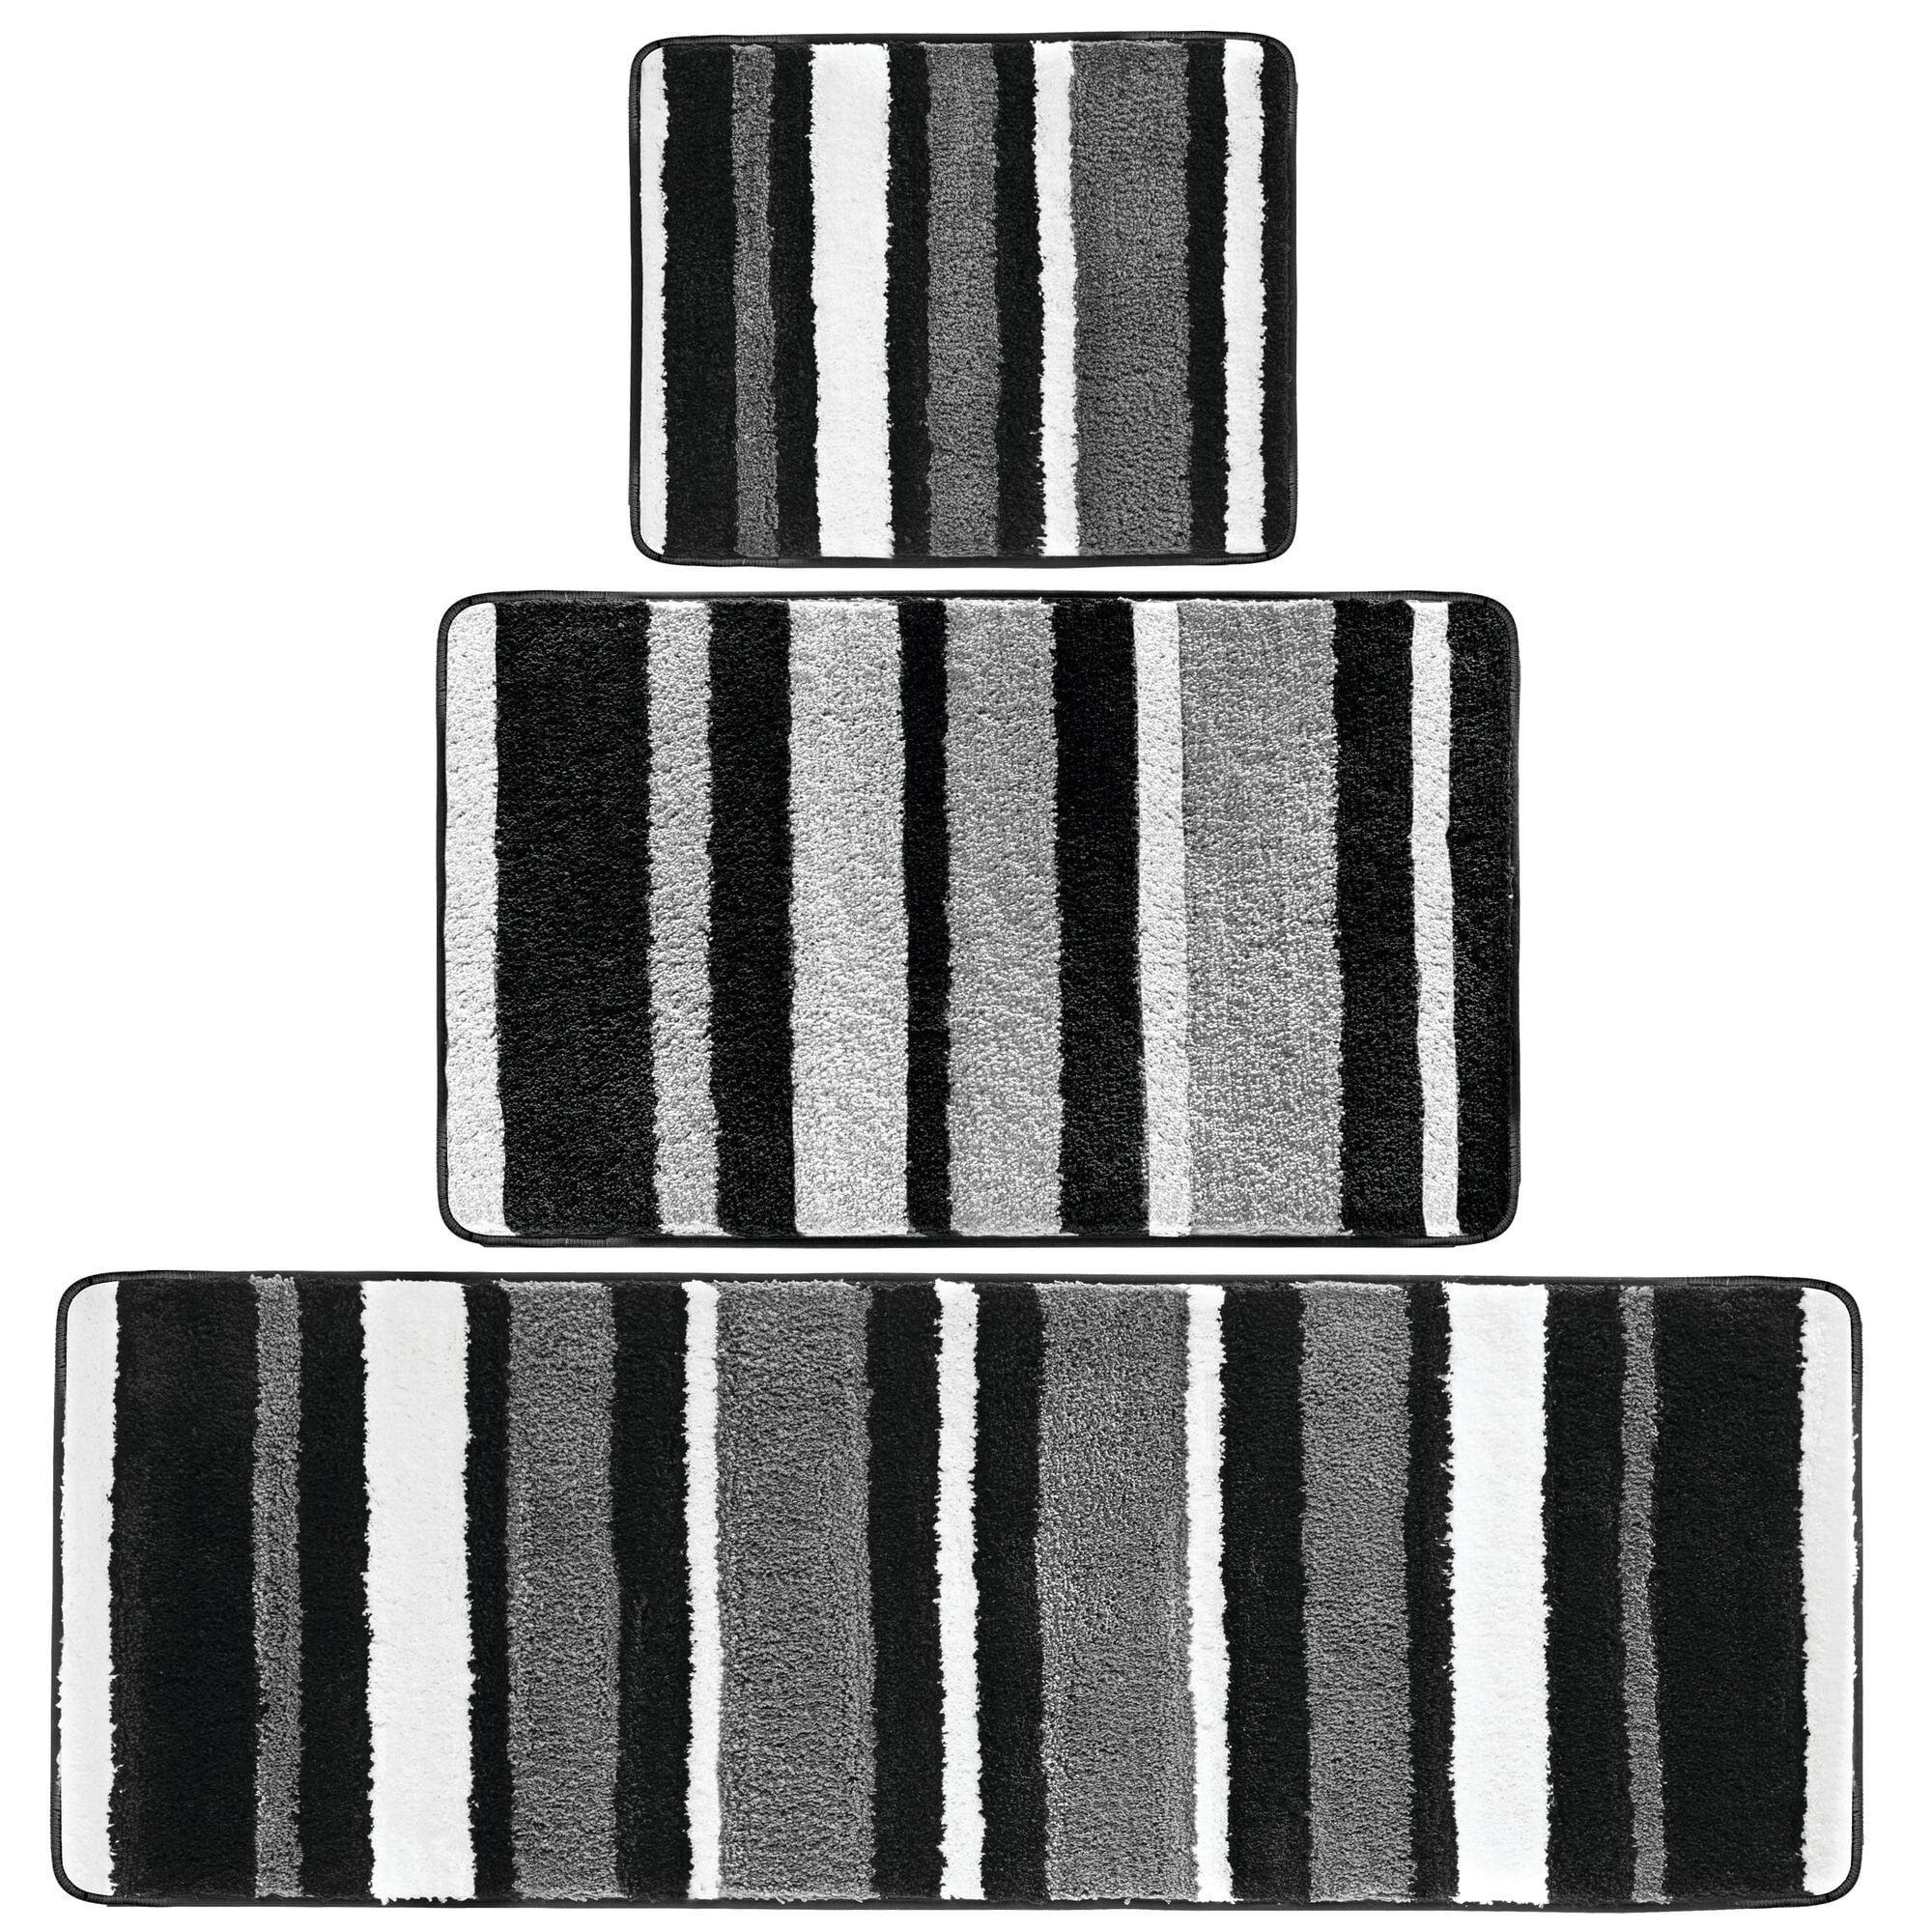 mDesign Soft Microfiber Spa Rugs for Bathroom Vanity Tub//Shower Set of 2